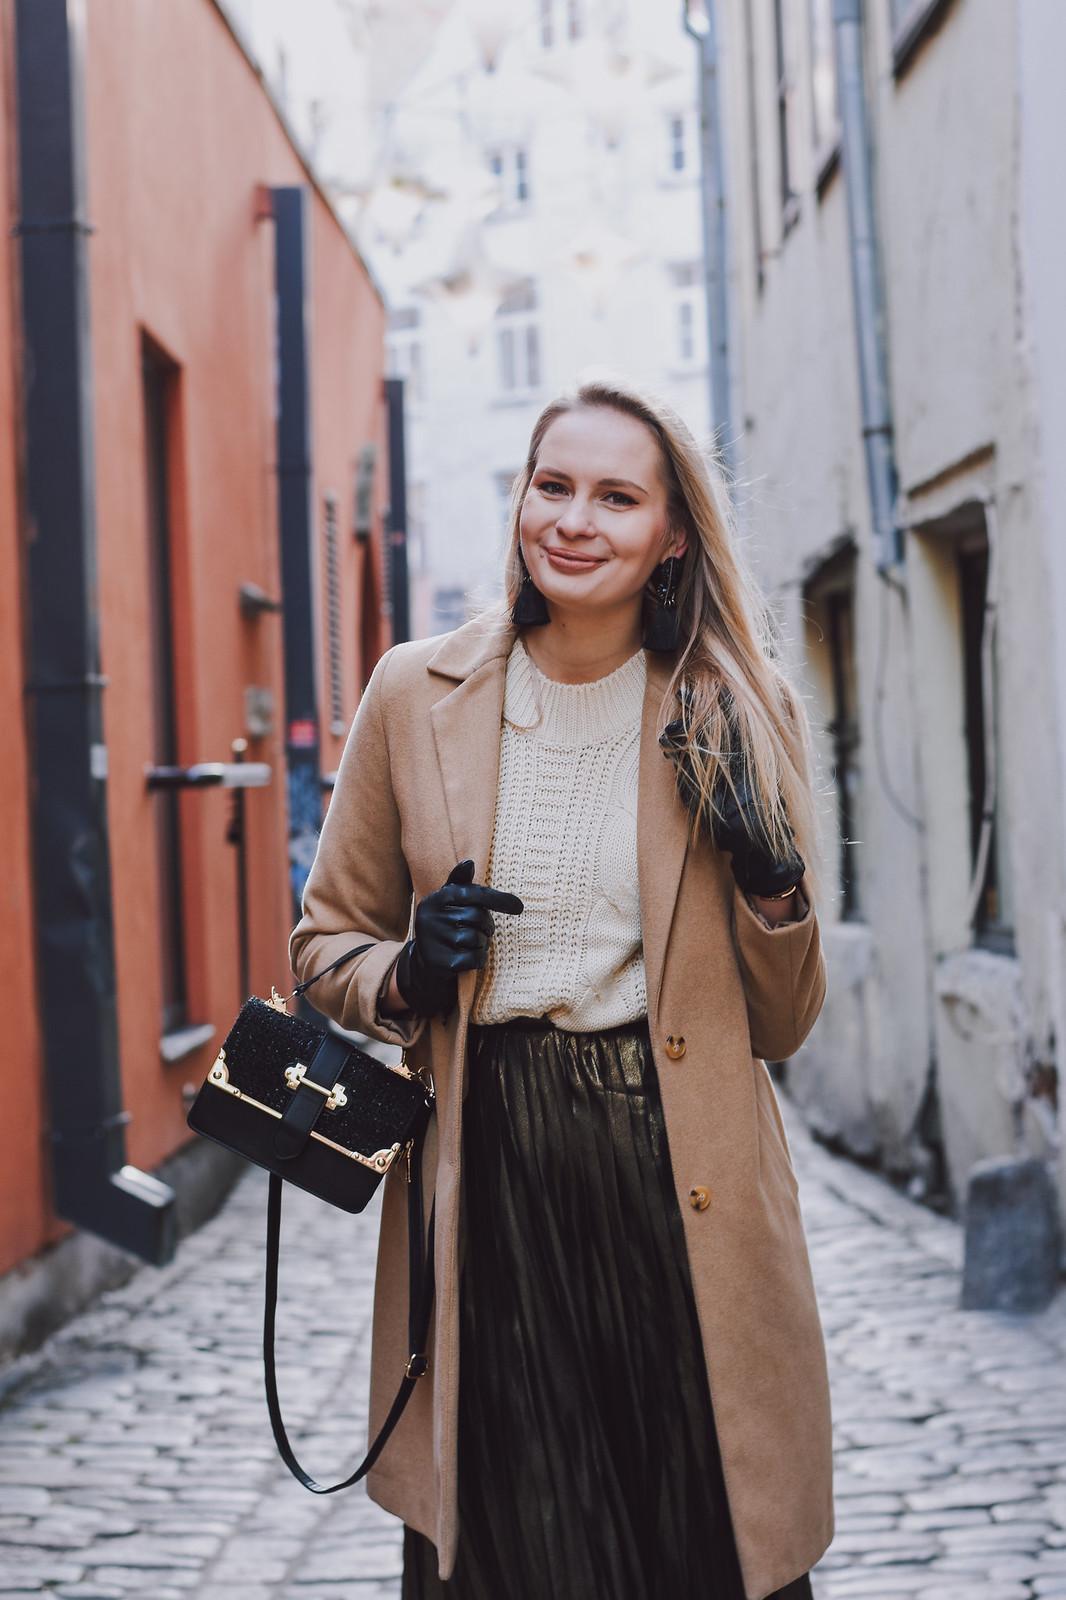 Camel coat outfit inspiratiob